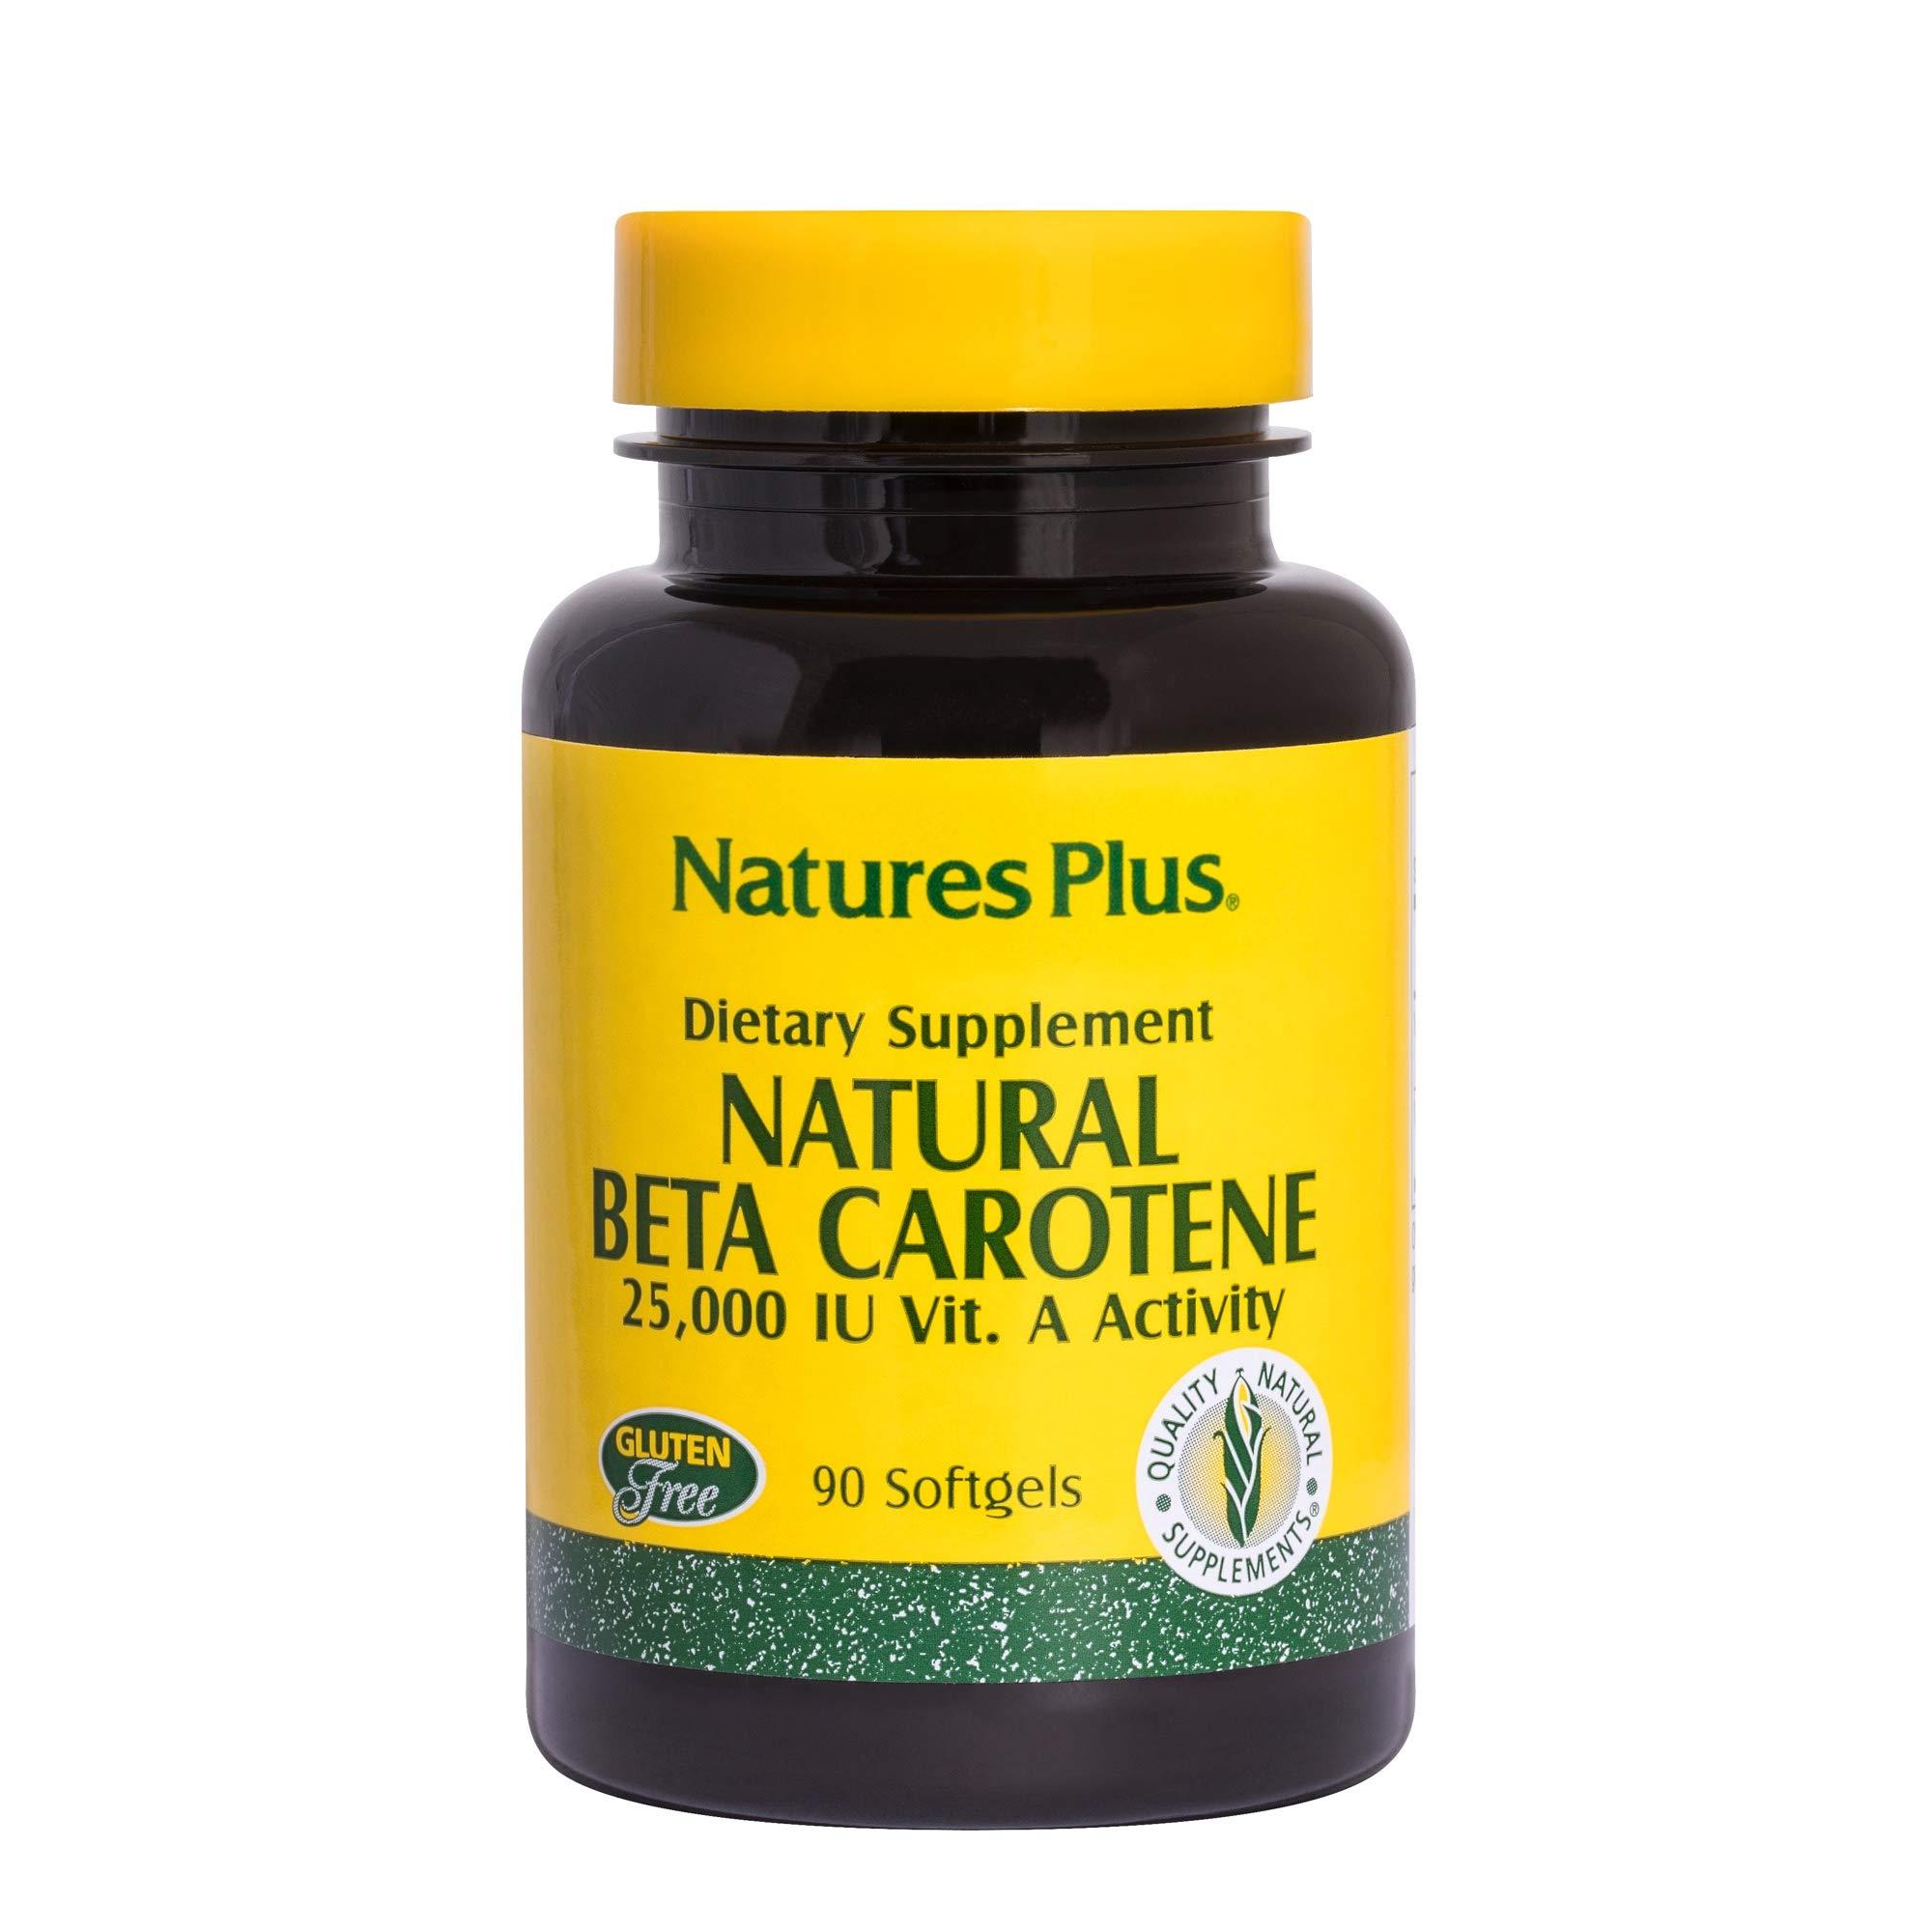 Natures Plus Natural Beta Carotene - 25,000 IU Vitamin A & Vitamin E, 90 Softgels - Eye Supplement, Antioxidant, Aids in Free Radical & Natural Cellular Defense - Gluten Free - 90 Servings